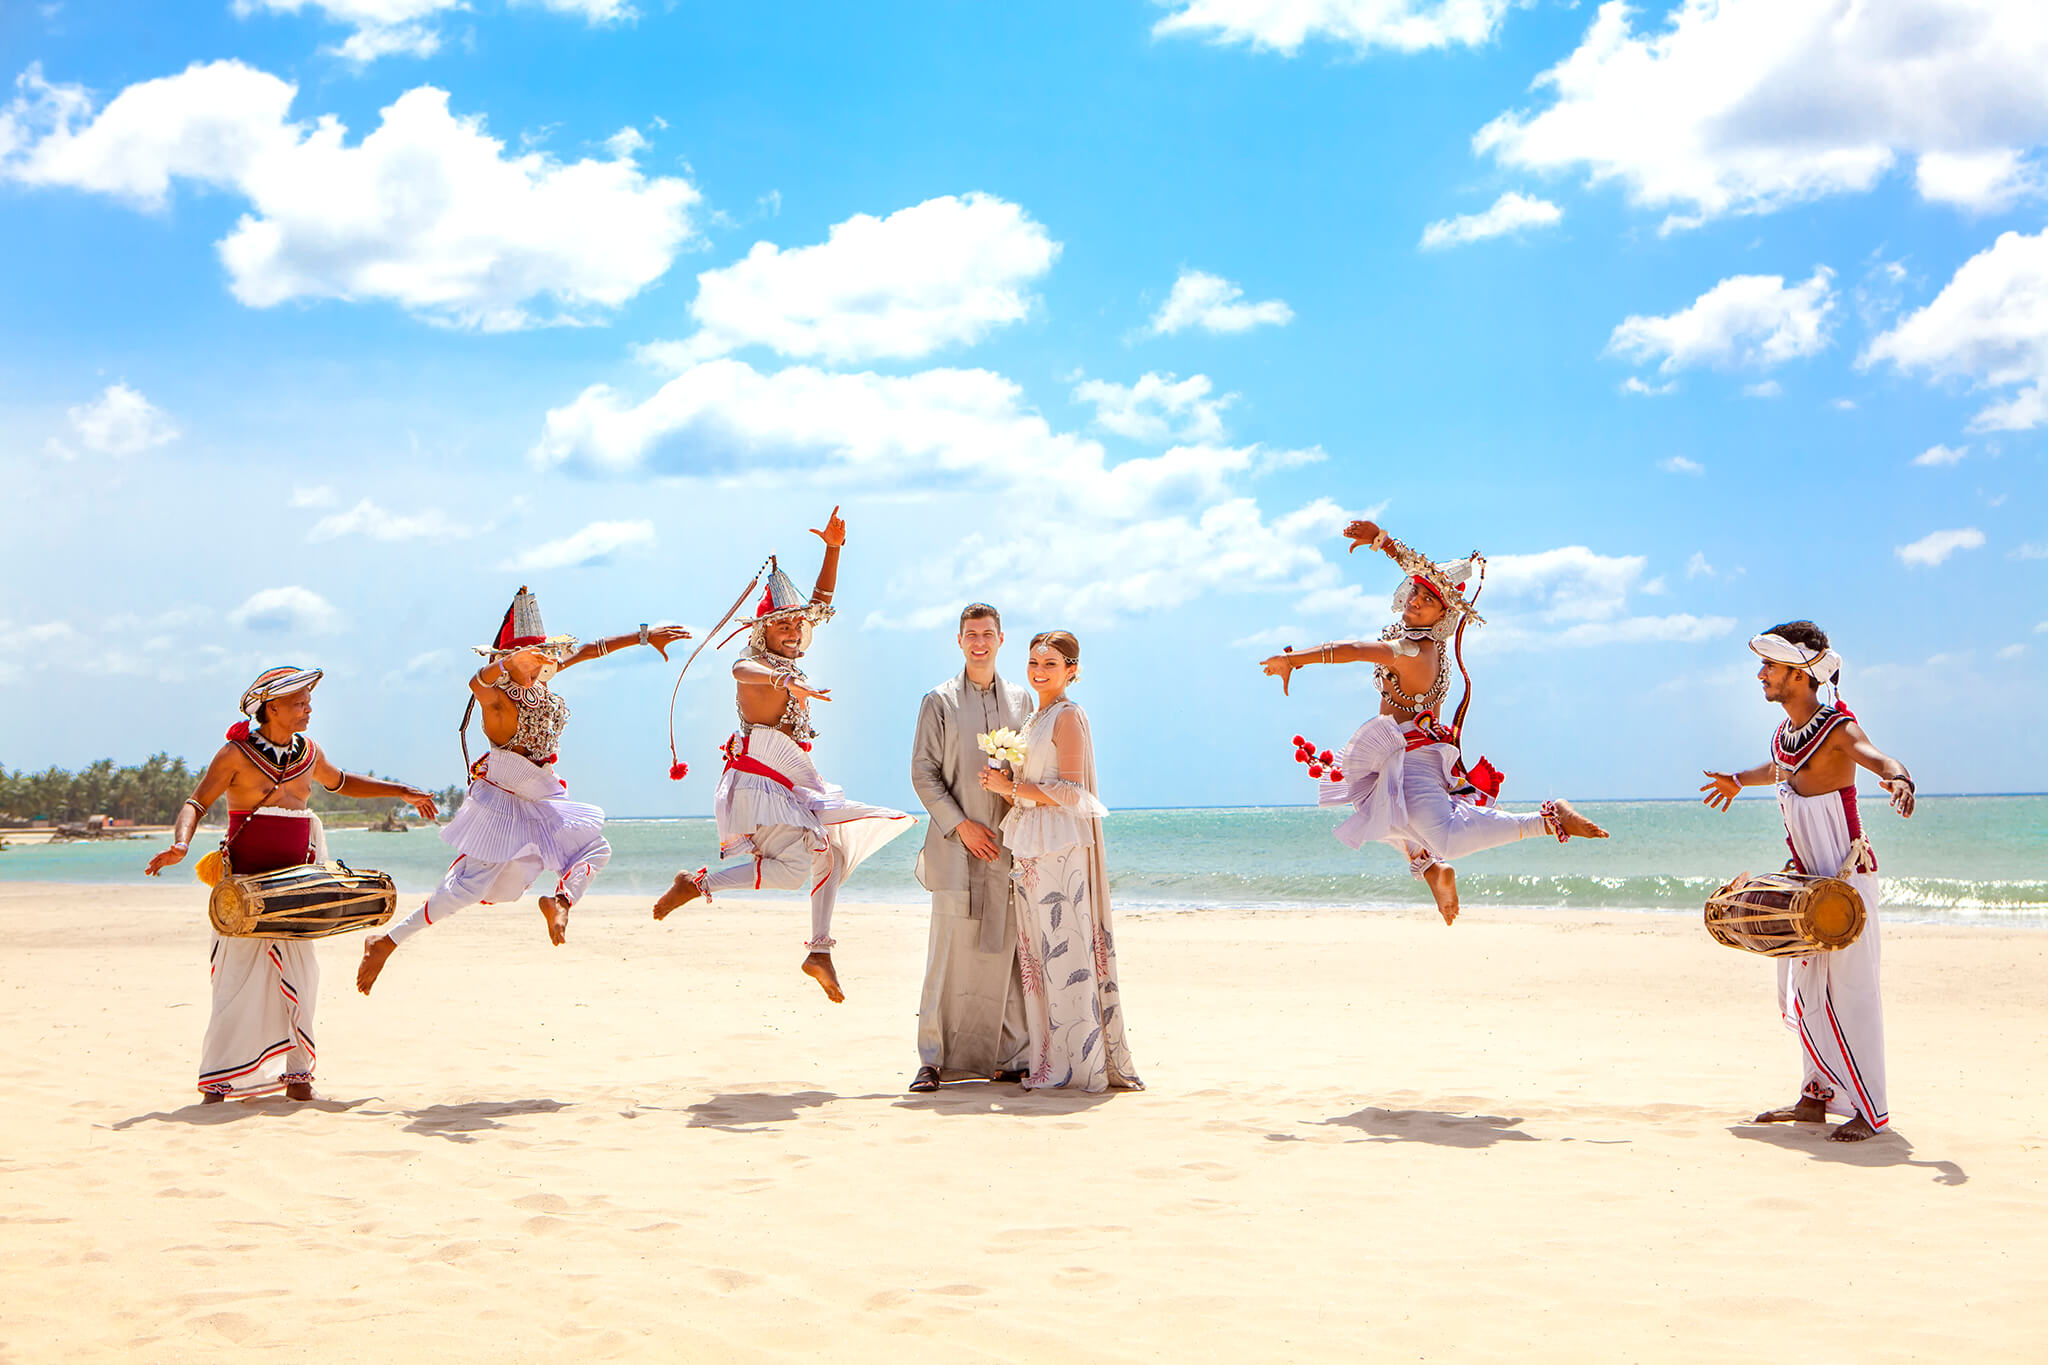 azra-dominics-poruwa-wedding-in-sri-lanka-pt-1